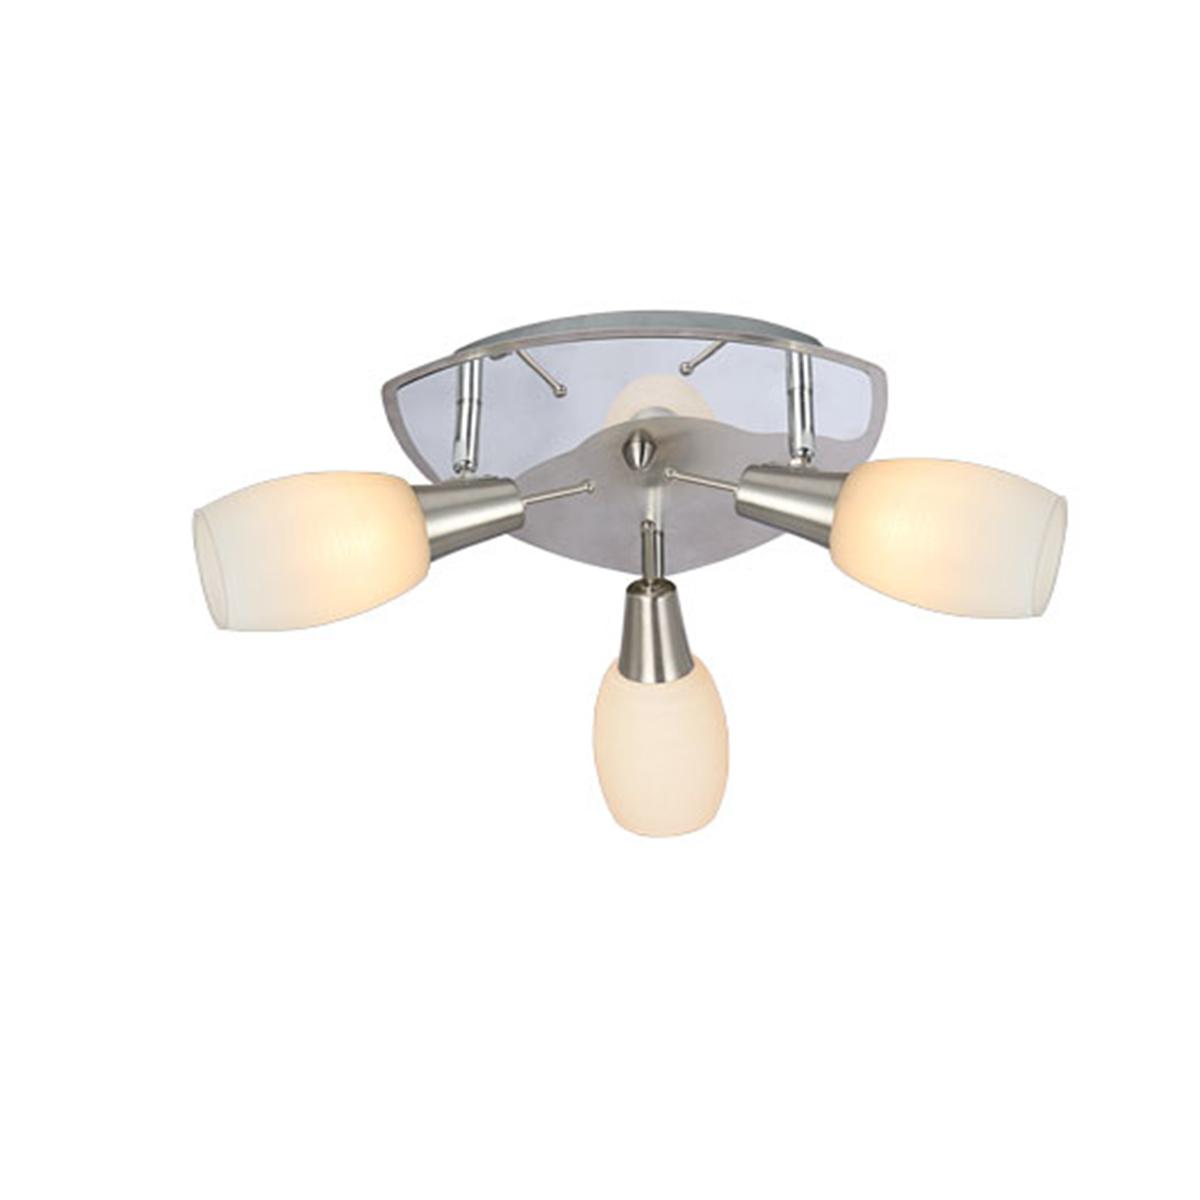 Spot lampa Polaris/3 6600973